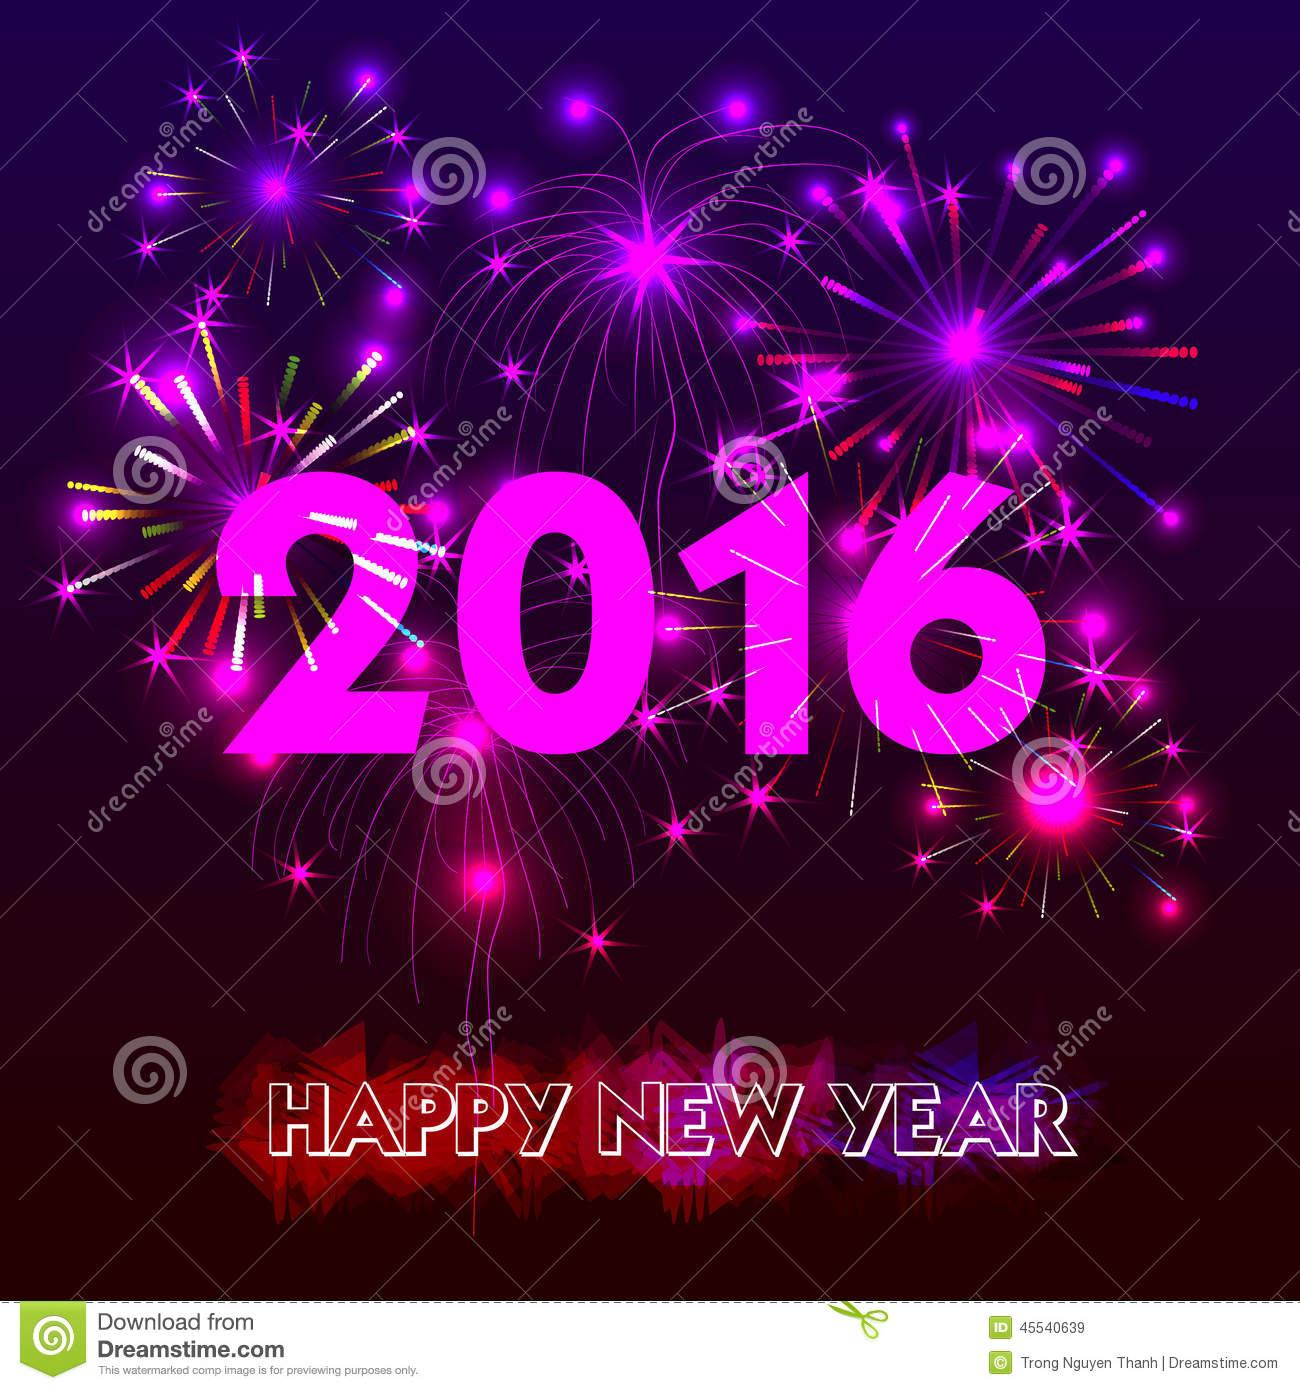 Happy New Year 2016 Image Wallpaper 17179 Wallpaper computer 1300x1390